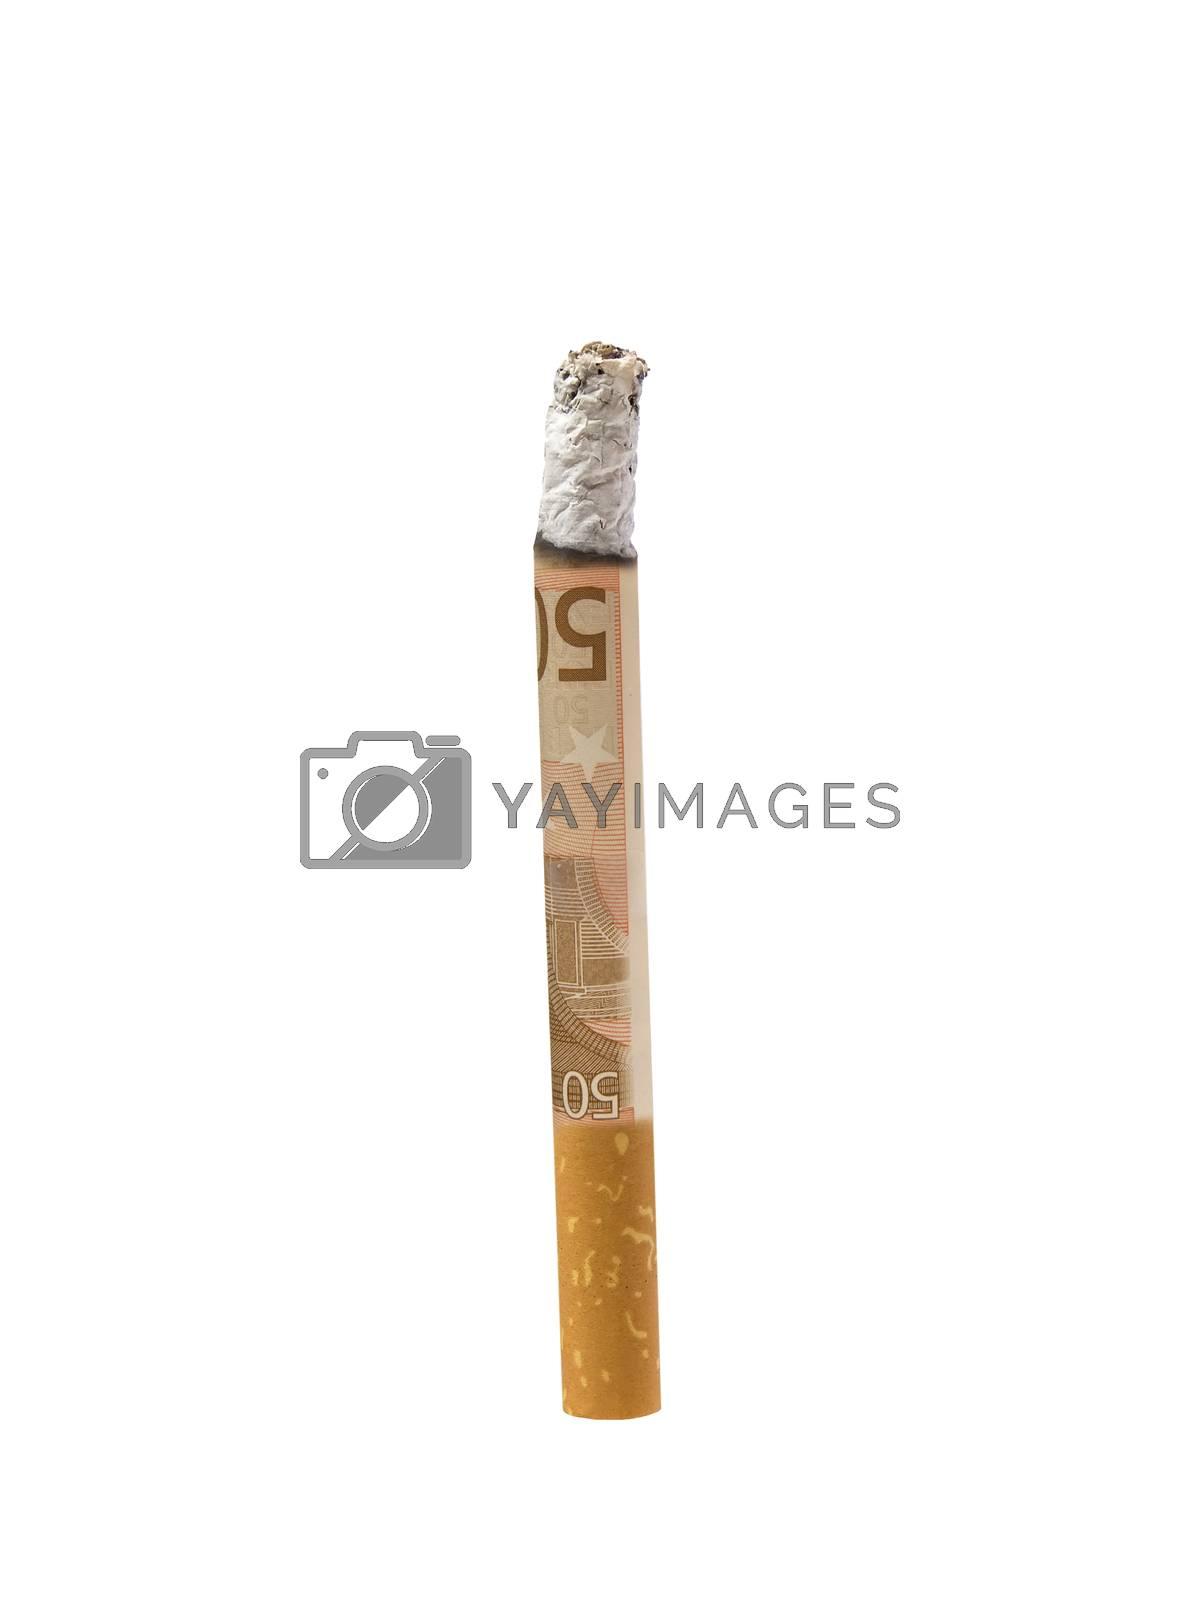 50 euro cigarette isolated on white